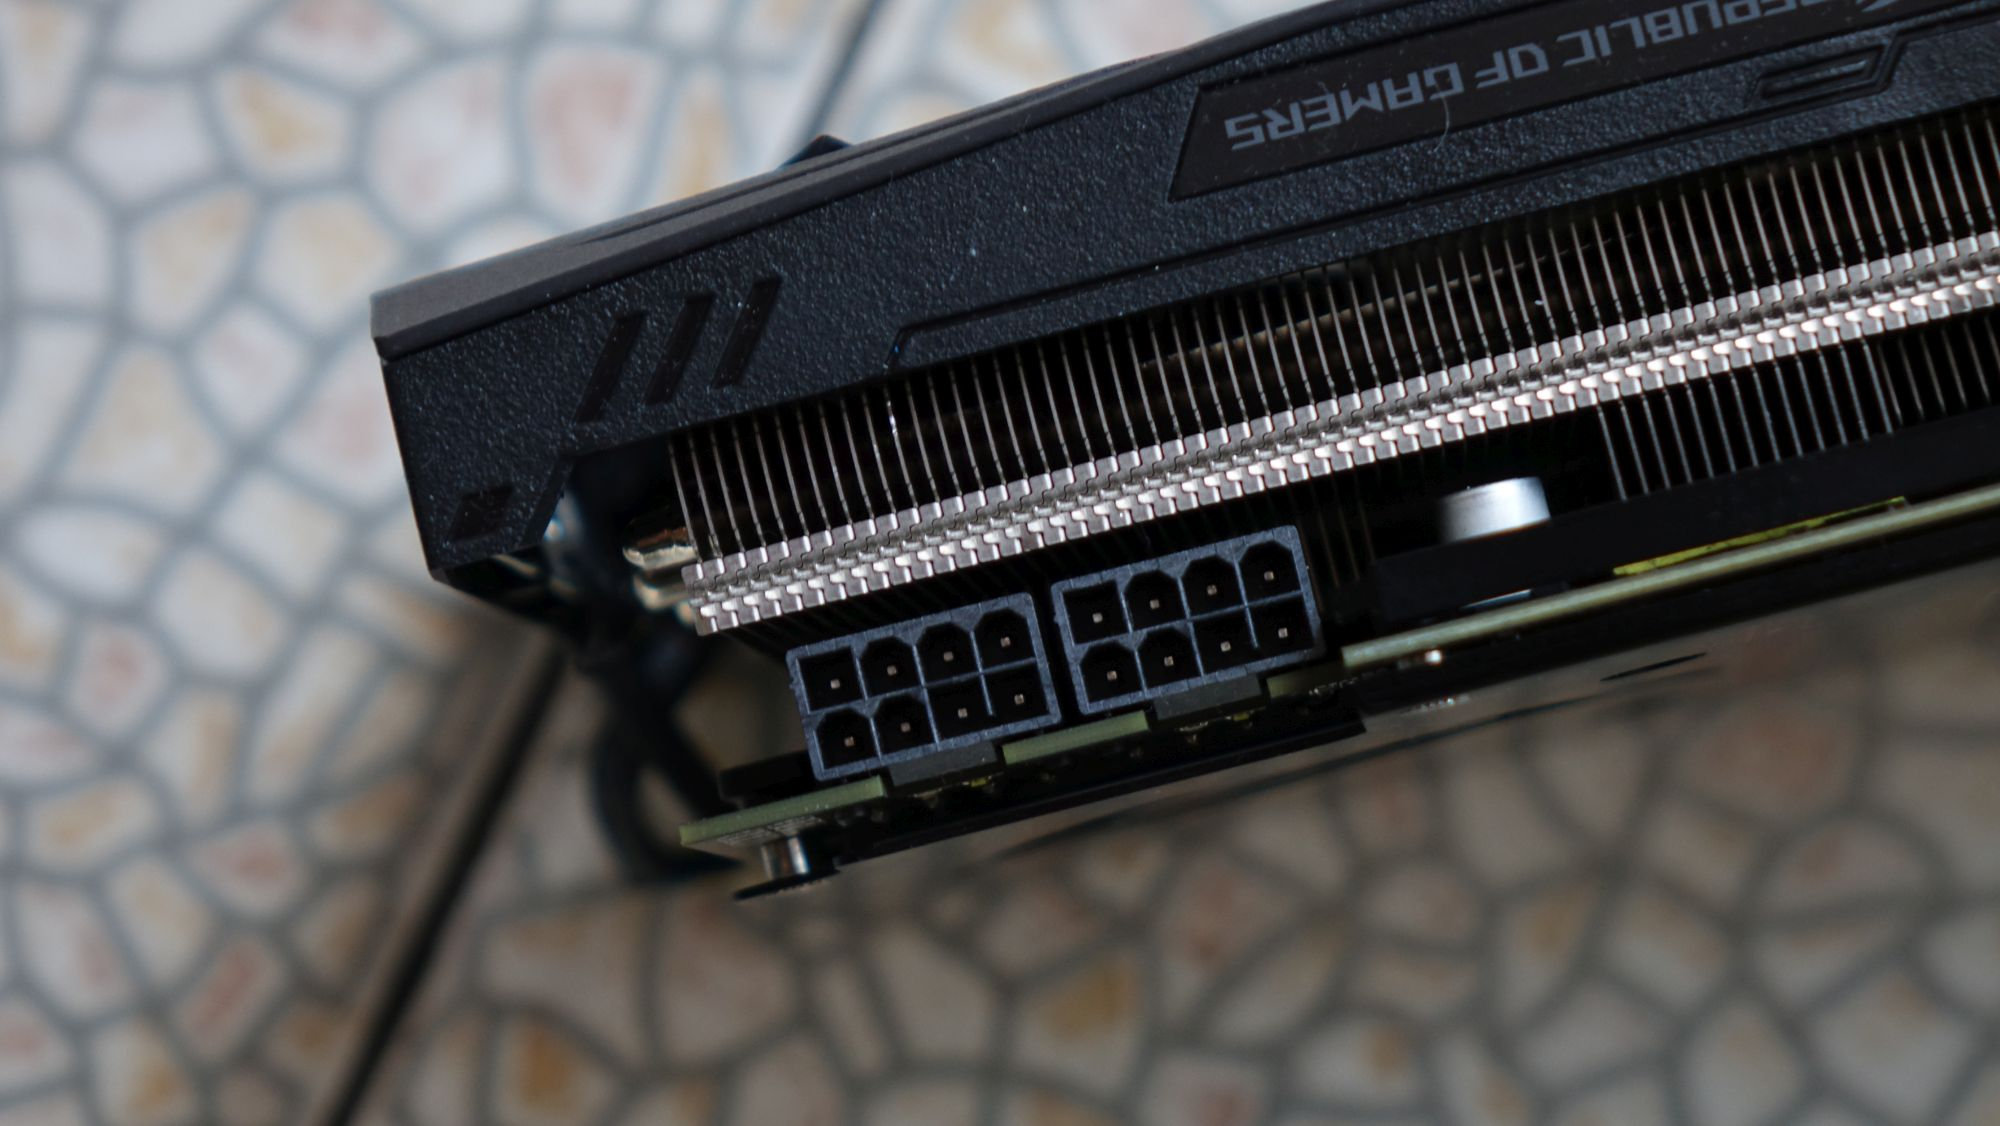 ASUS ROG Strix RX VEGA 64 8-pin